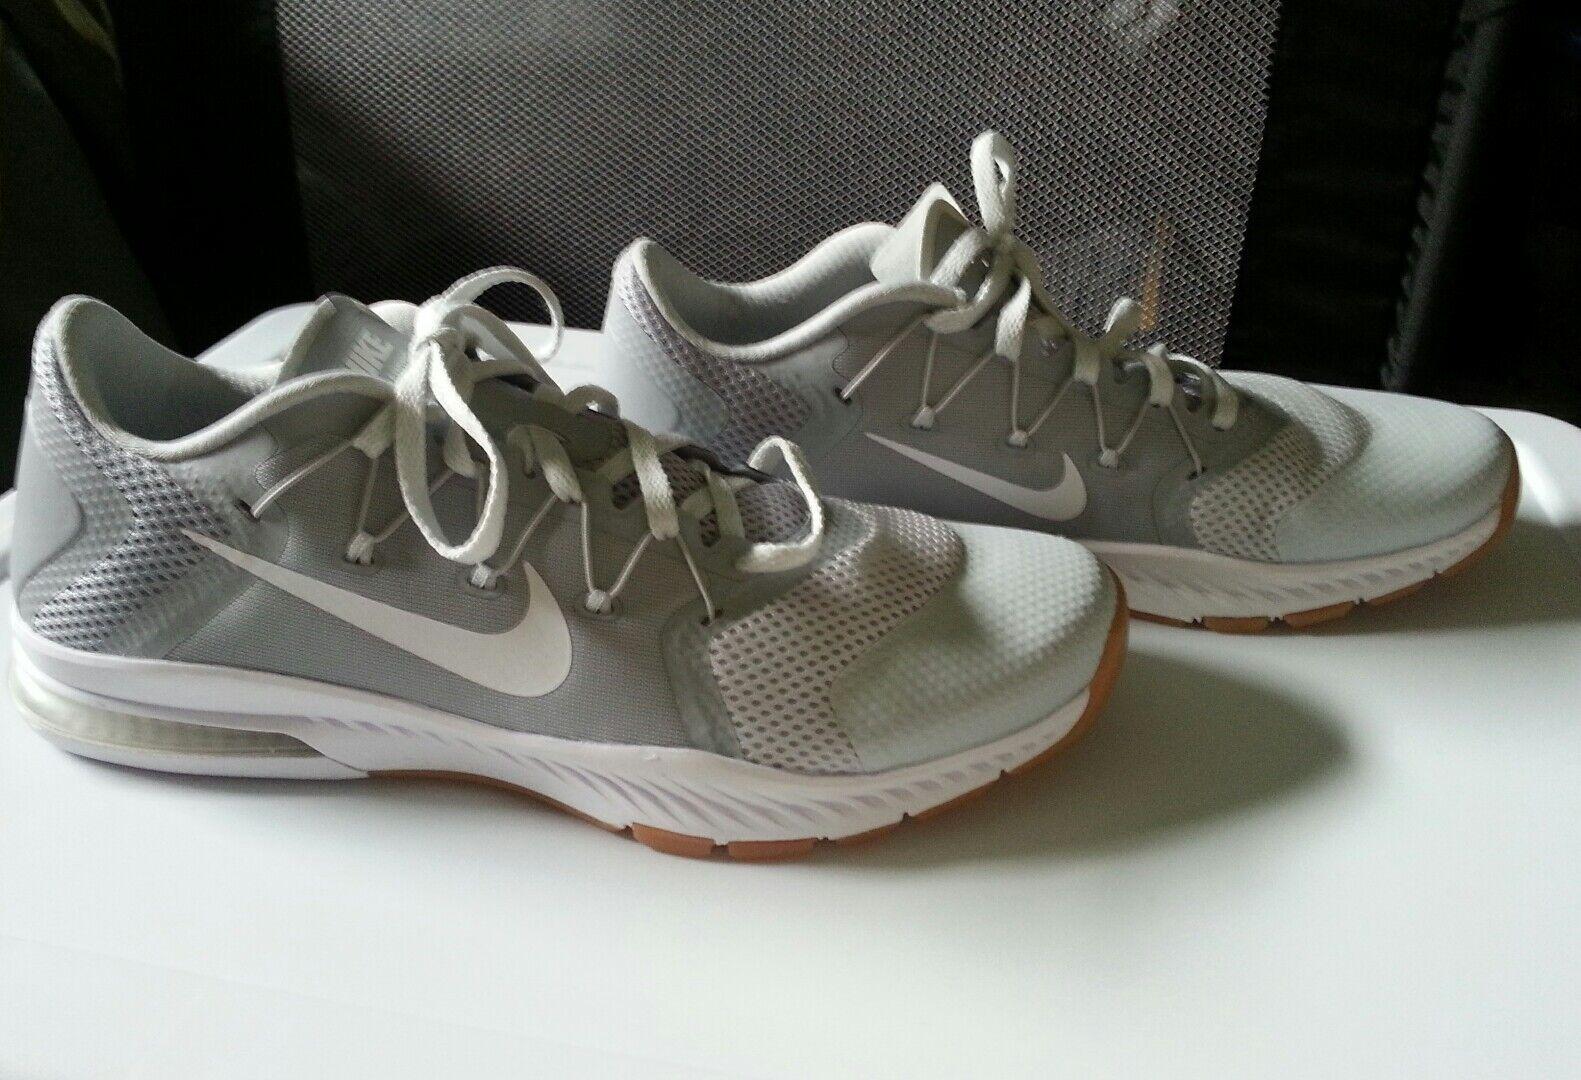 Nike Hommes Training Blanc Chaussures 82119-005 gris / Blanc Training  Taille 10.5 NWOB a2b622